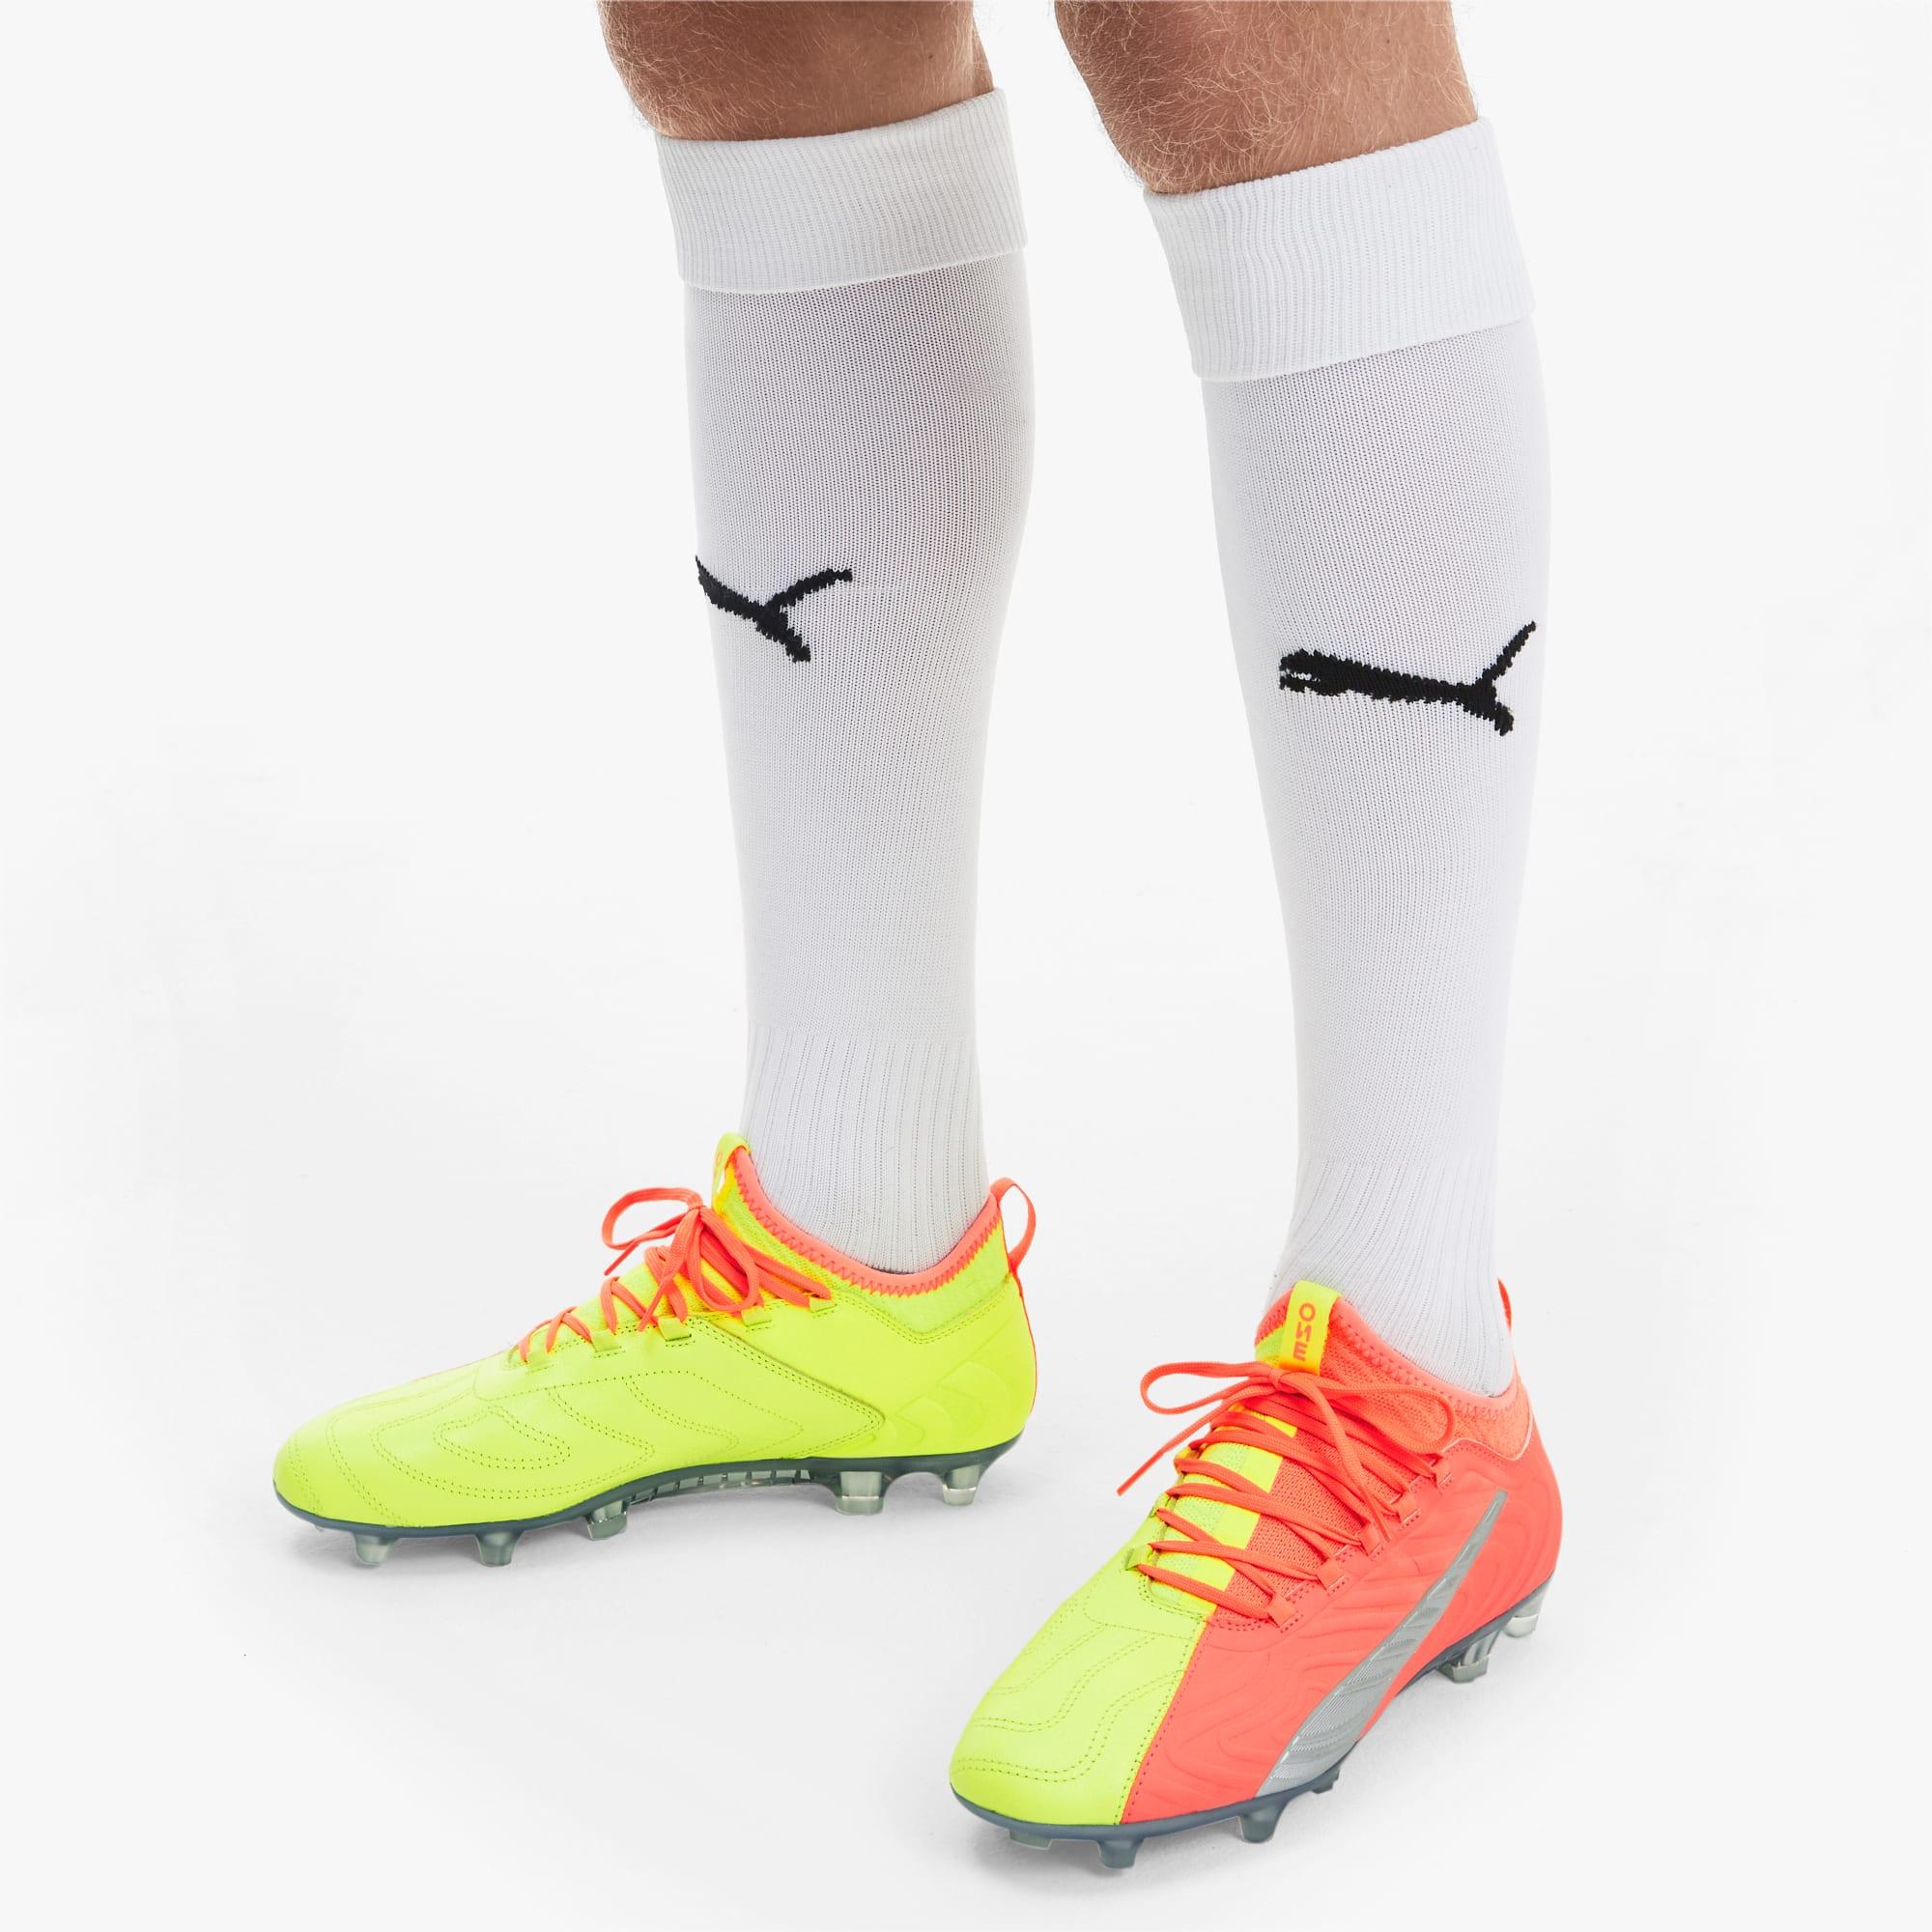 PUMA ONE 20.3 FG/AG Men's Football Boots